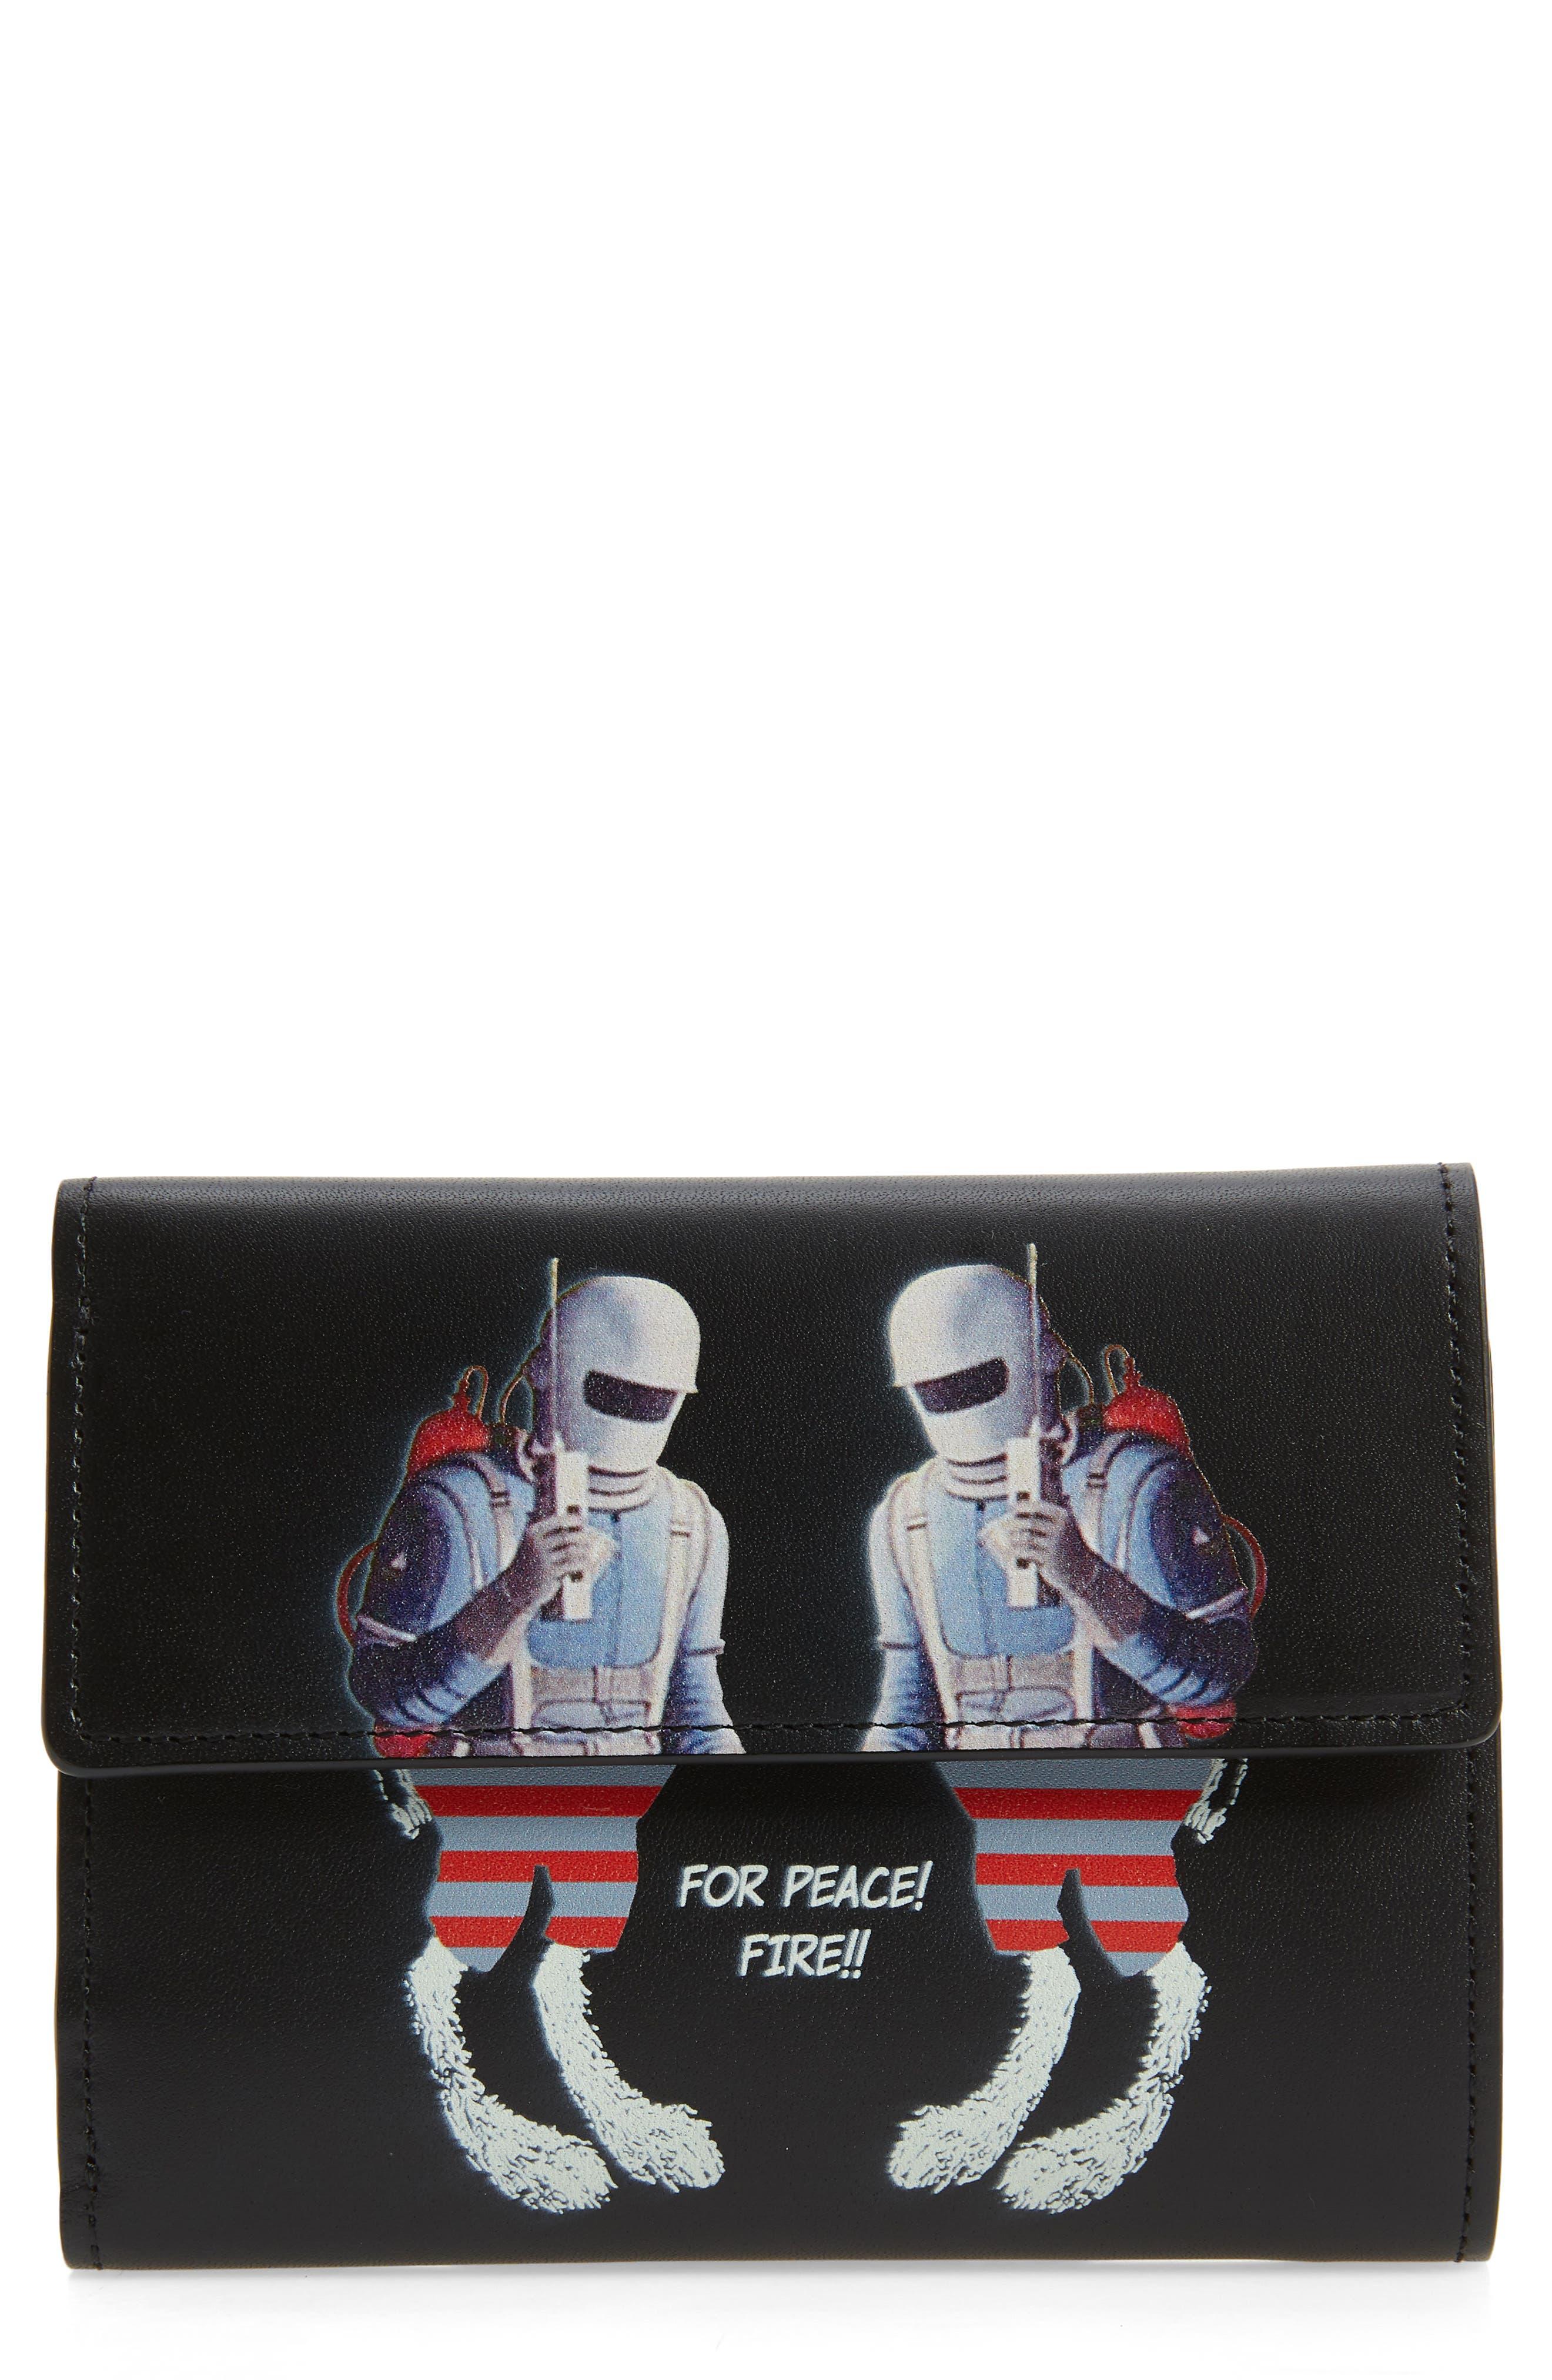 Spacemen Leather Wallet,                         Main,                         color, Black